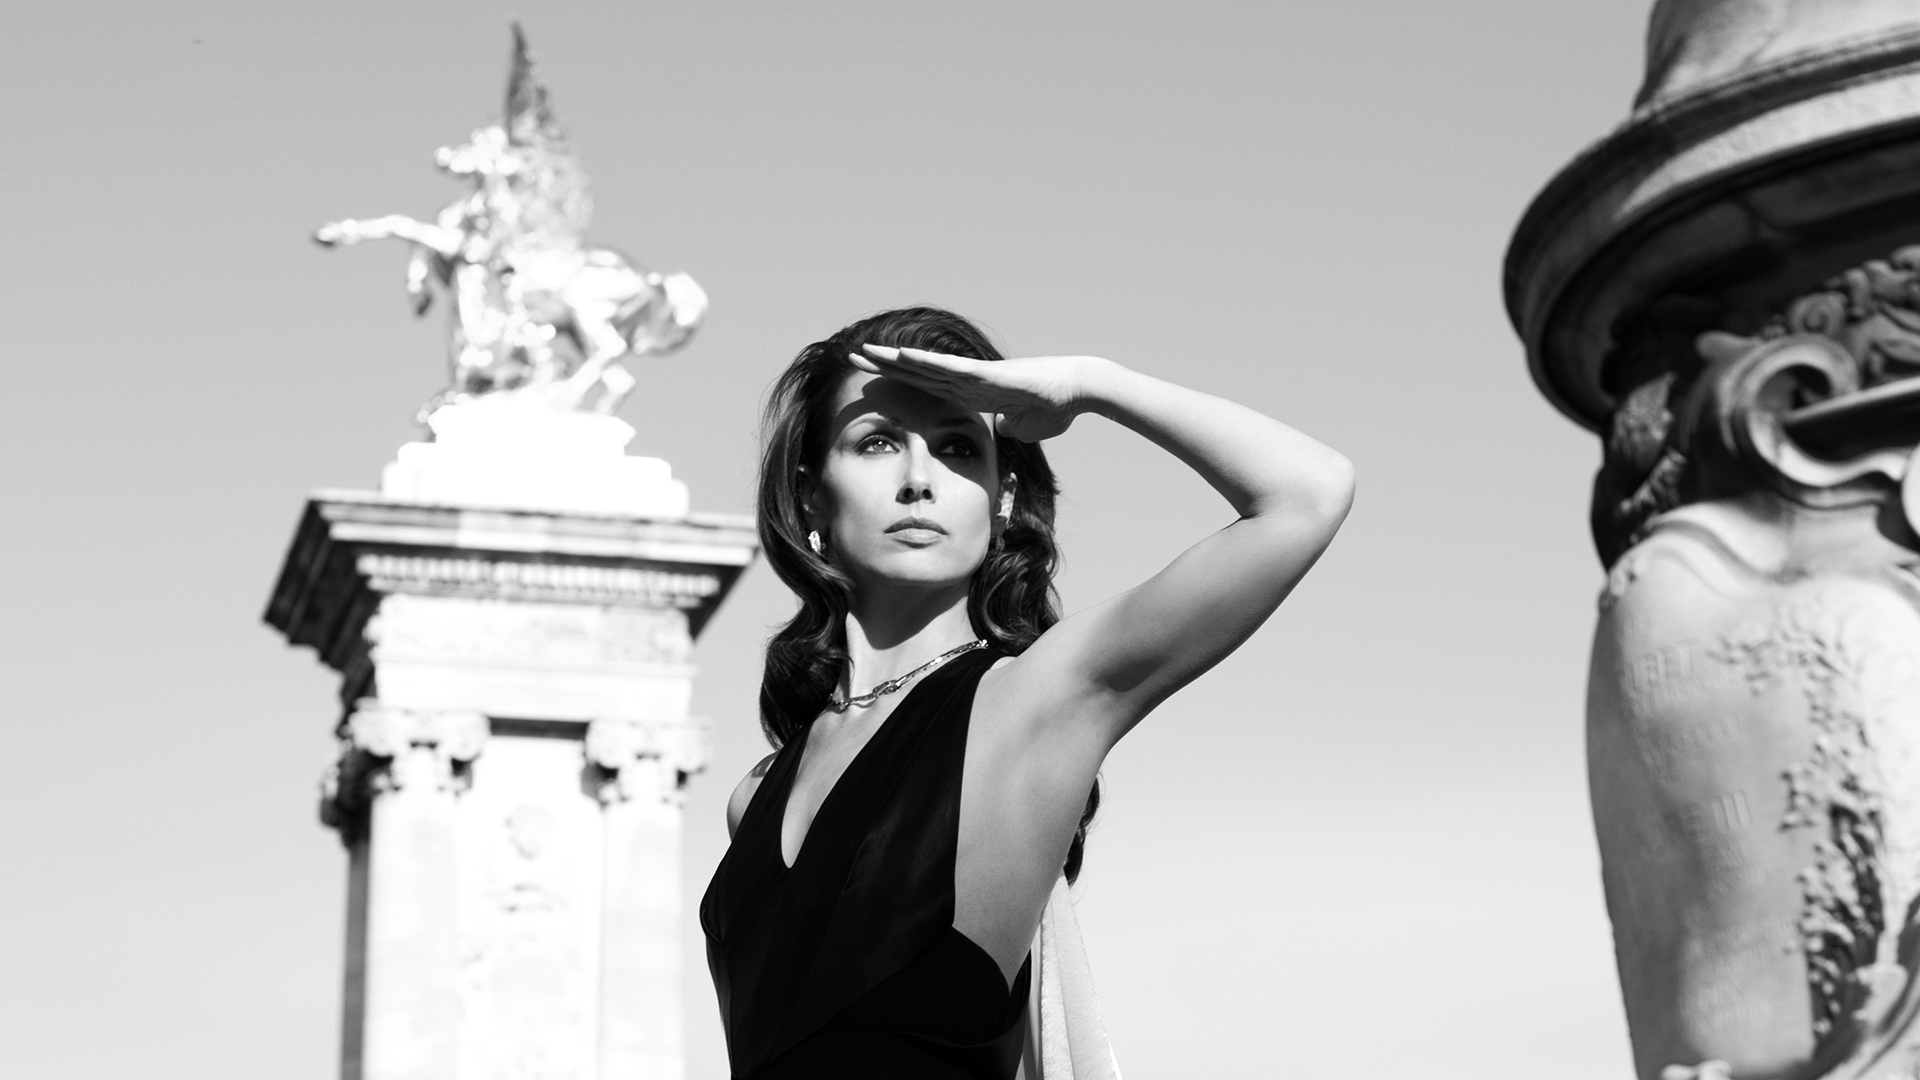 Bridget Moynahan is a black and white beauty on Point Alexandre III, Paris' famed bridge